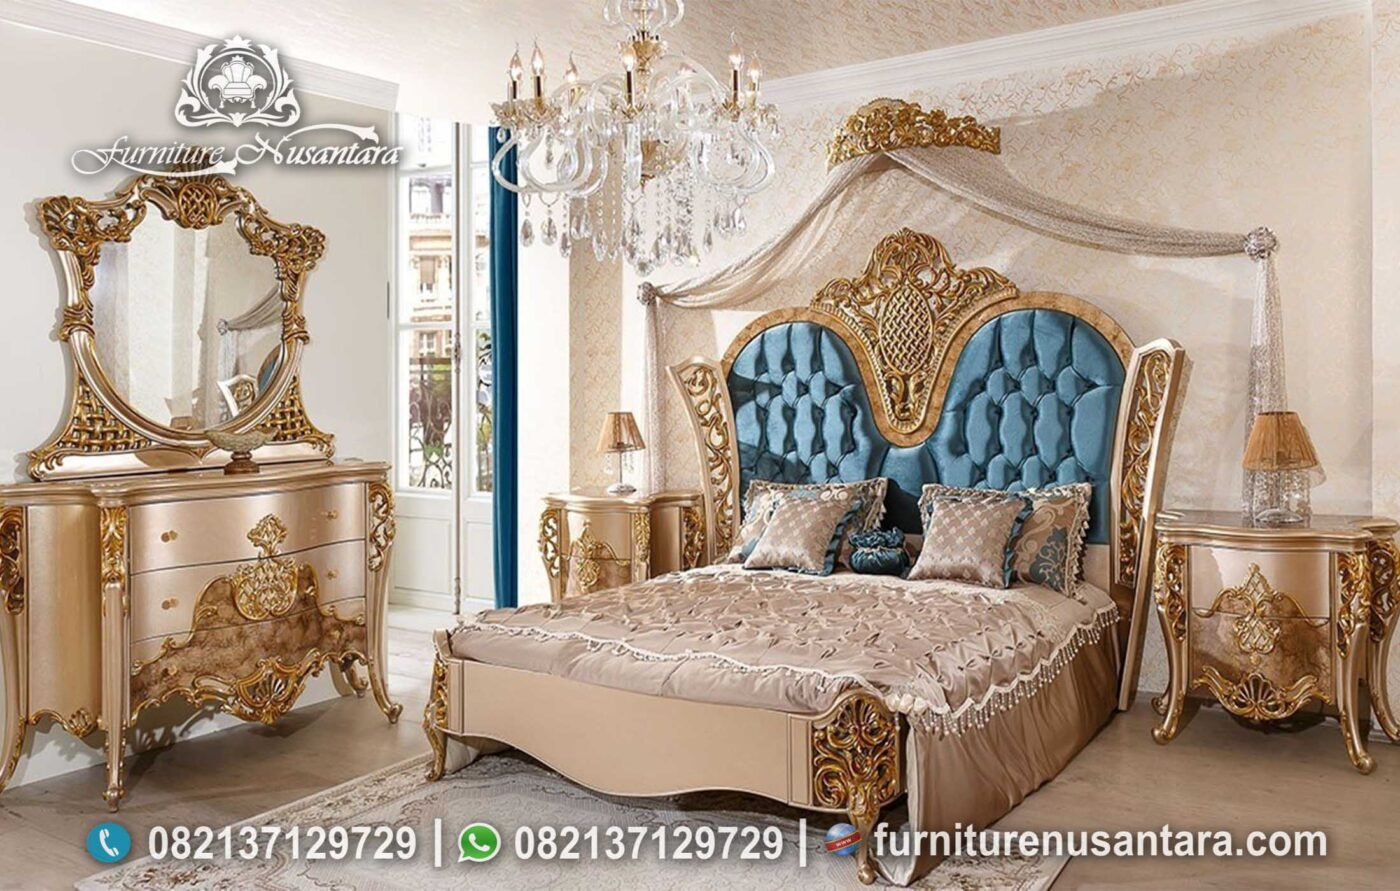 Jual Set Kamar Raja KS-37, Furniture Nusantara